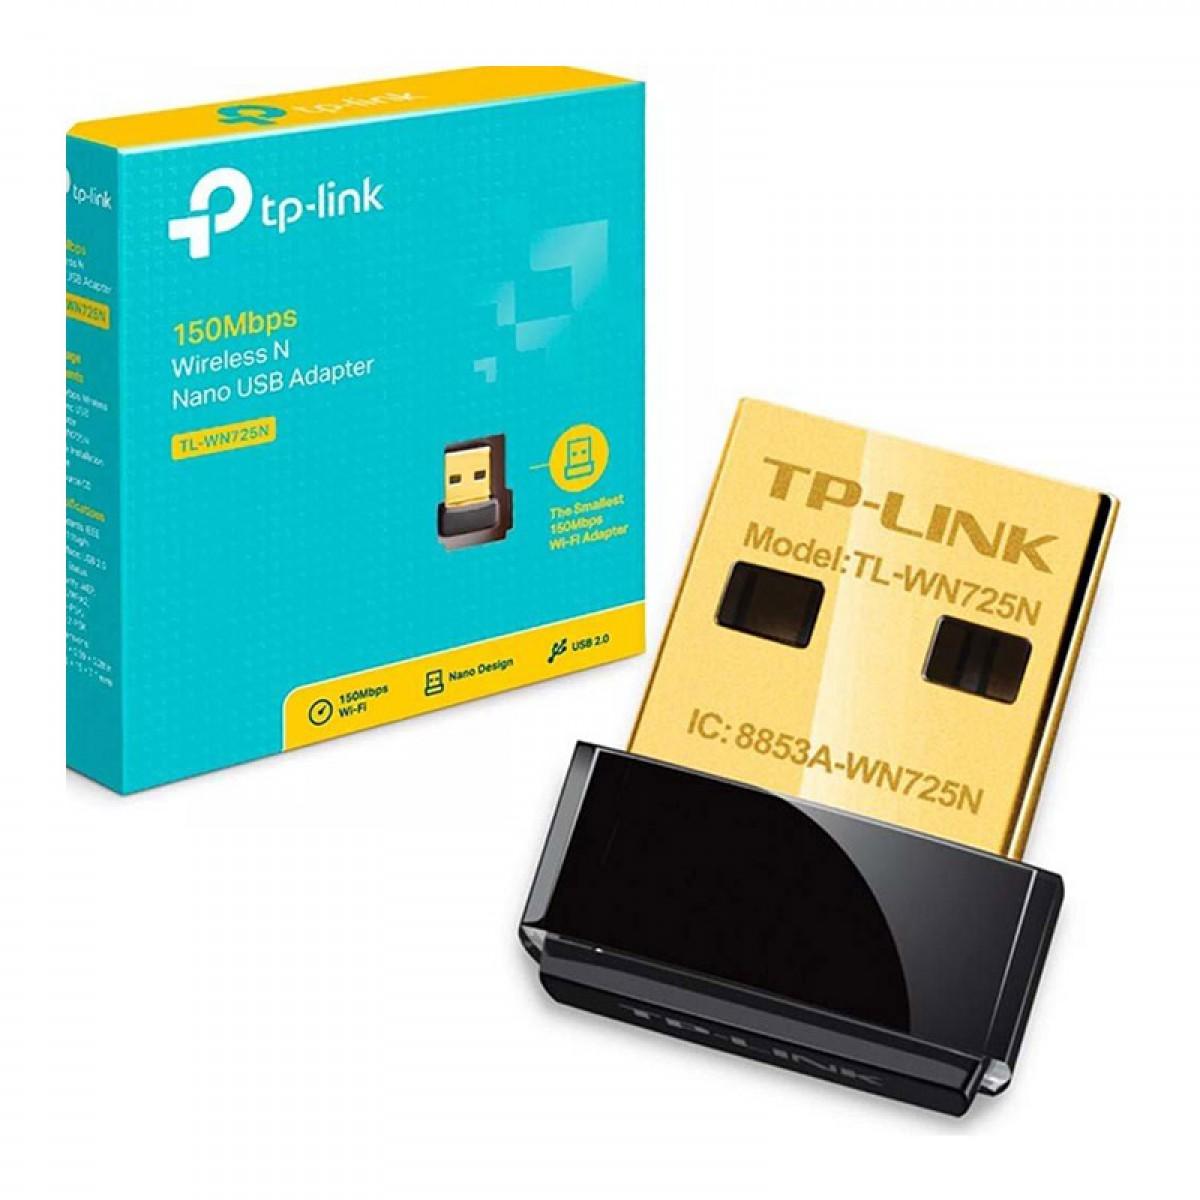 TP-LINK 150MBPS WIRELESS N NANO USB ADAPTER # TL-WN725N